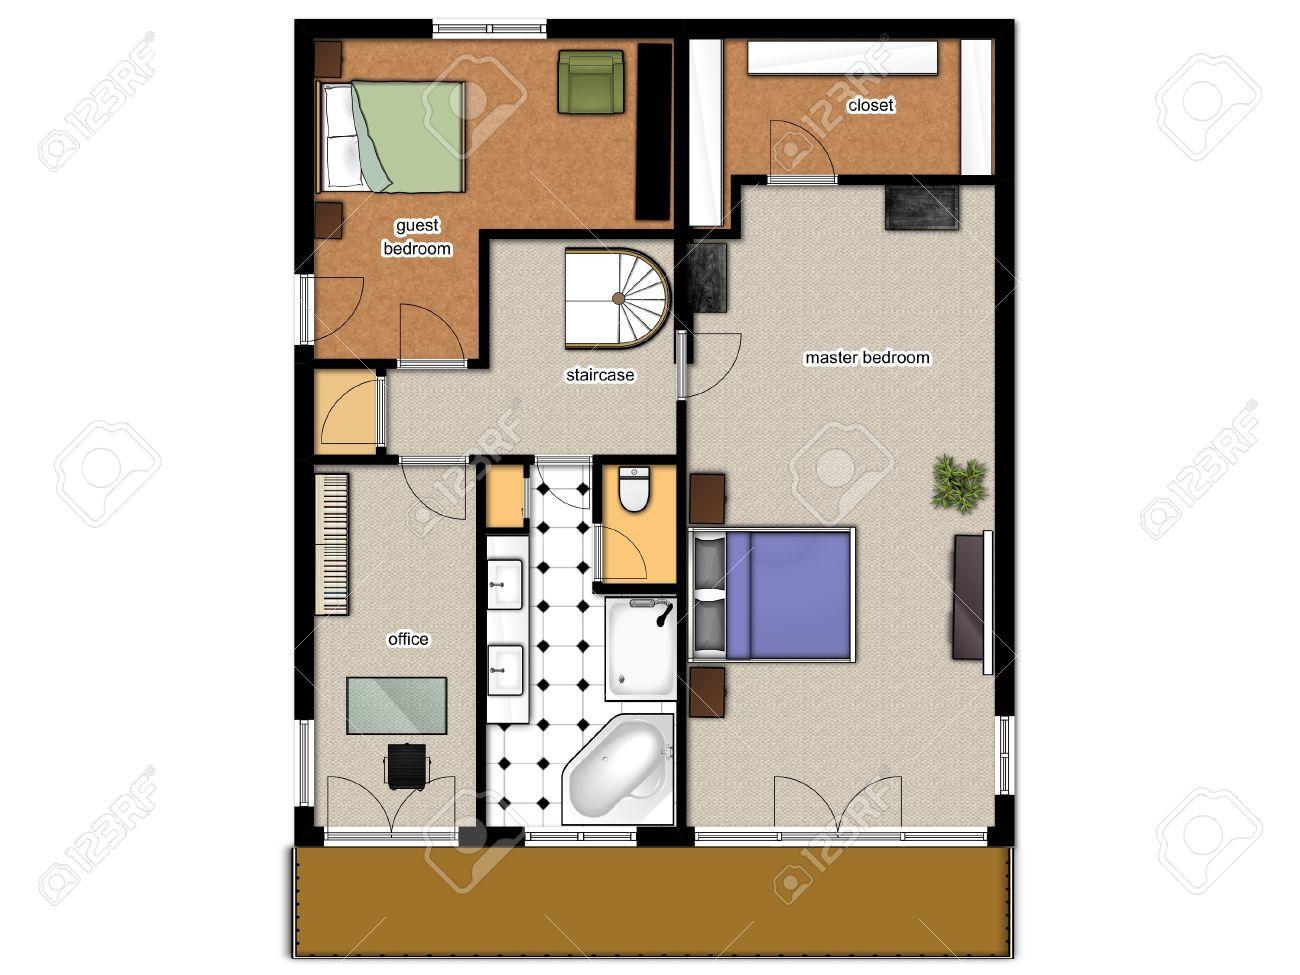 Bad Im Schlafzimmer Integriert Grundriss Satteldachhäuser Balance